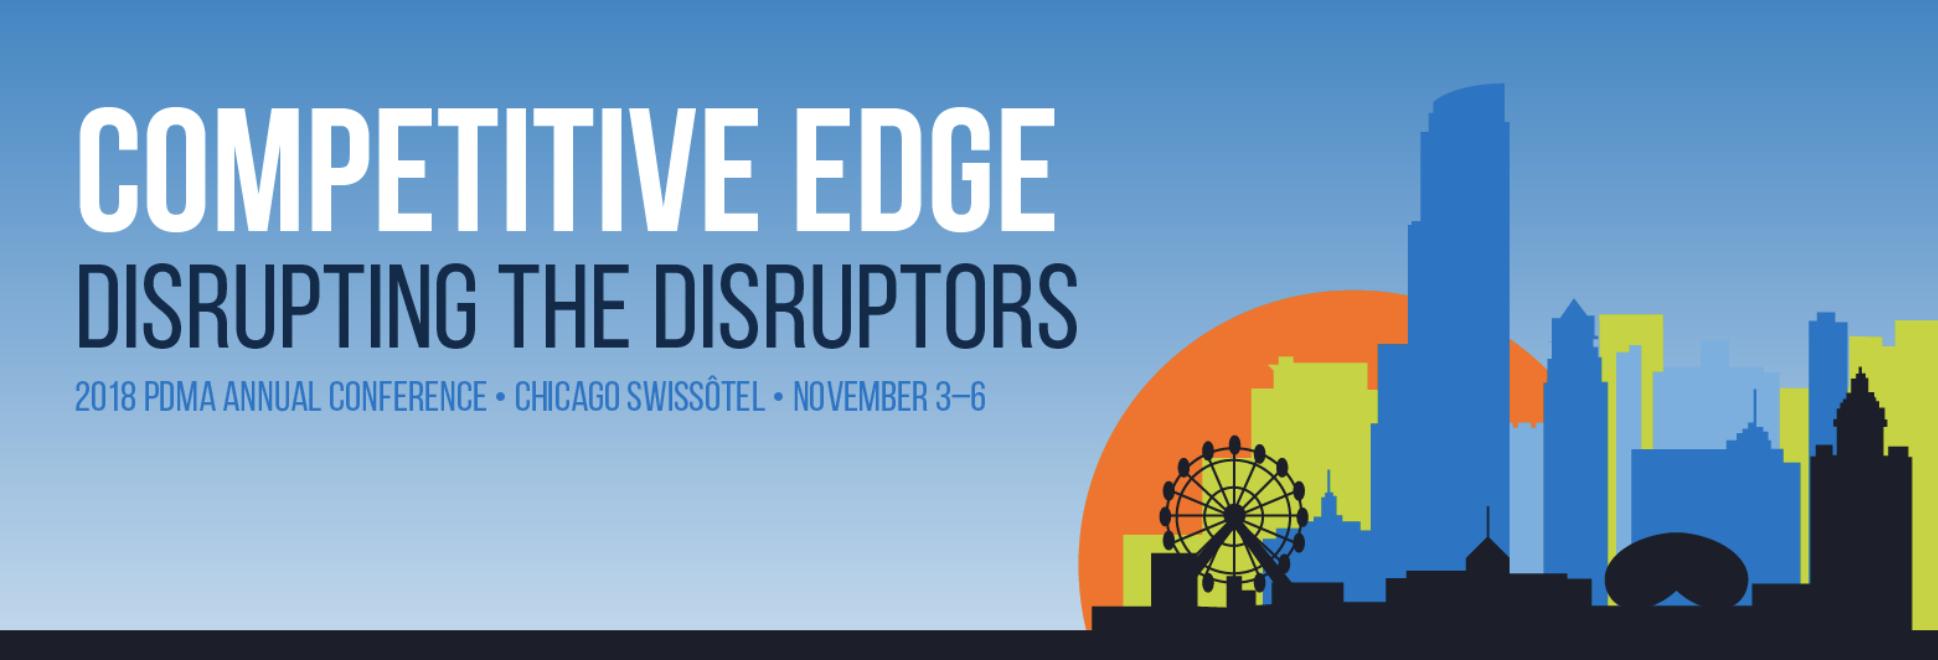 Competitive Edge Disrupting the Disruptors